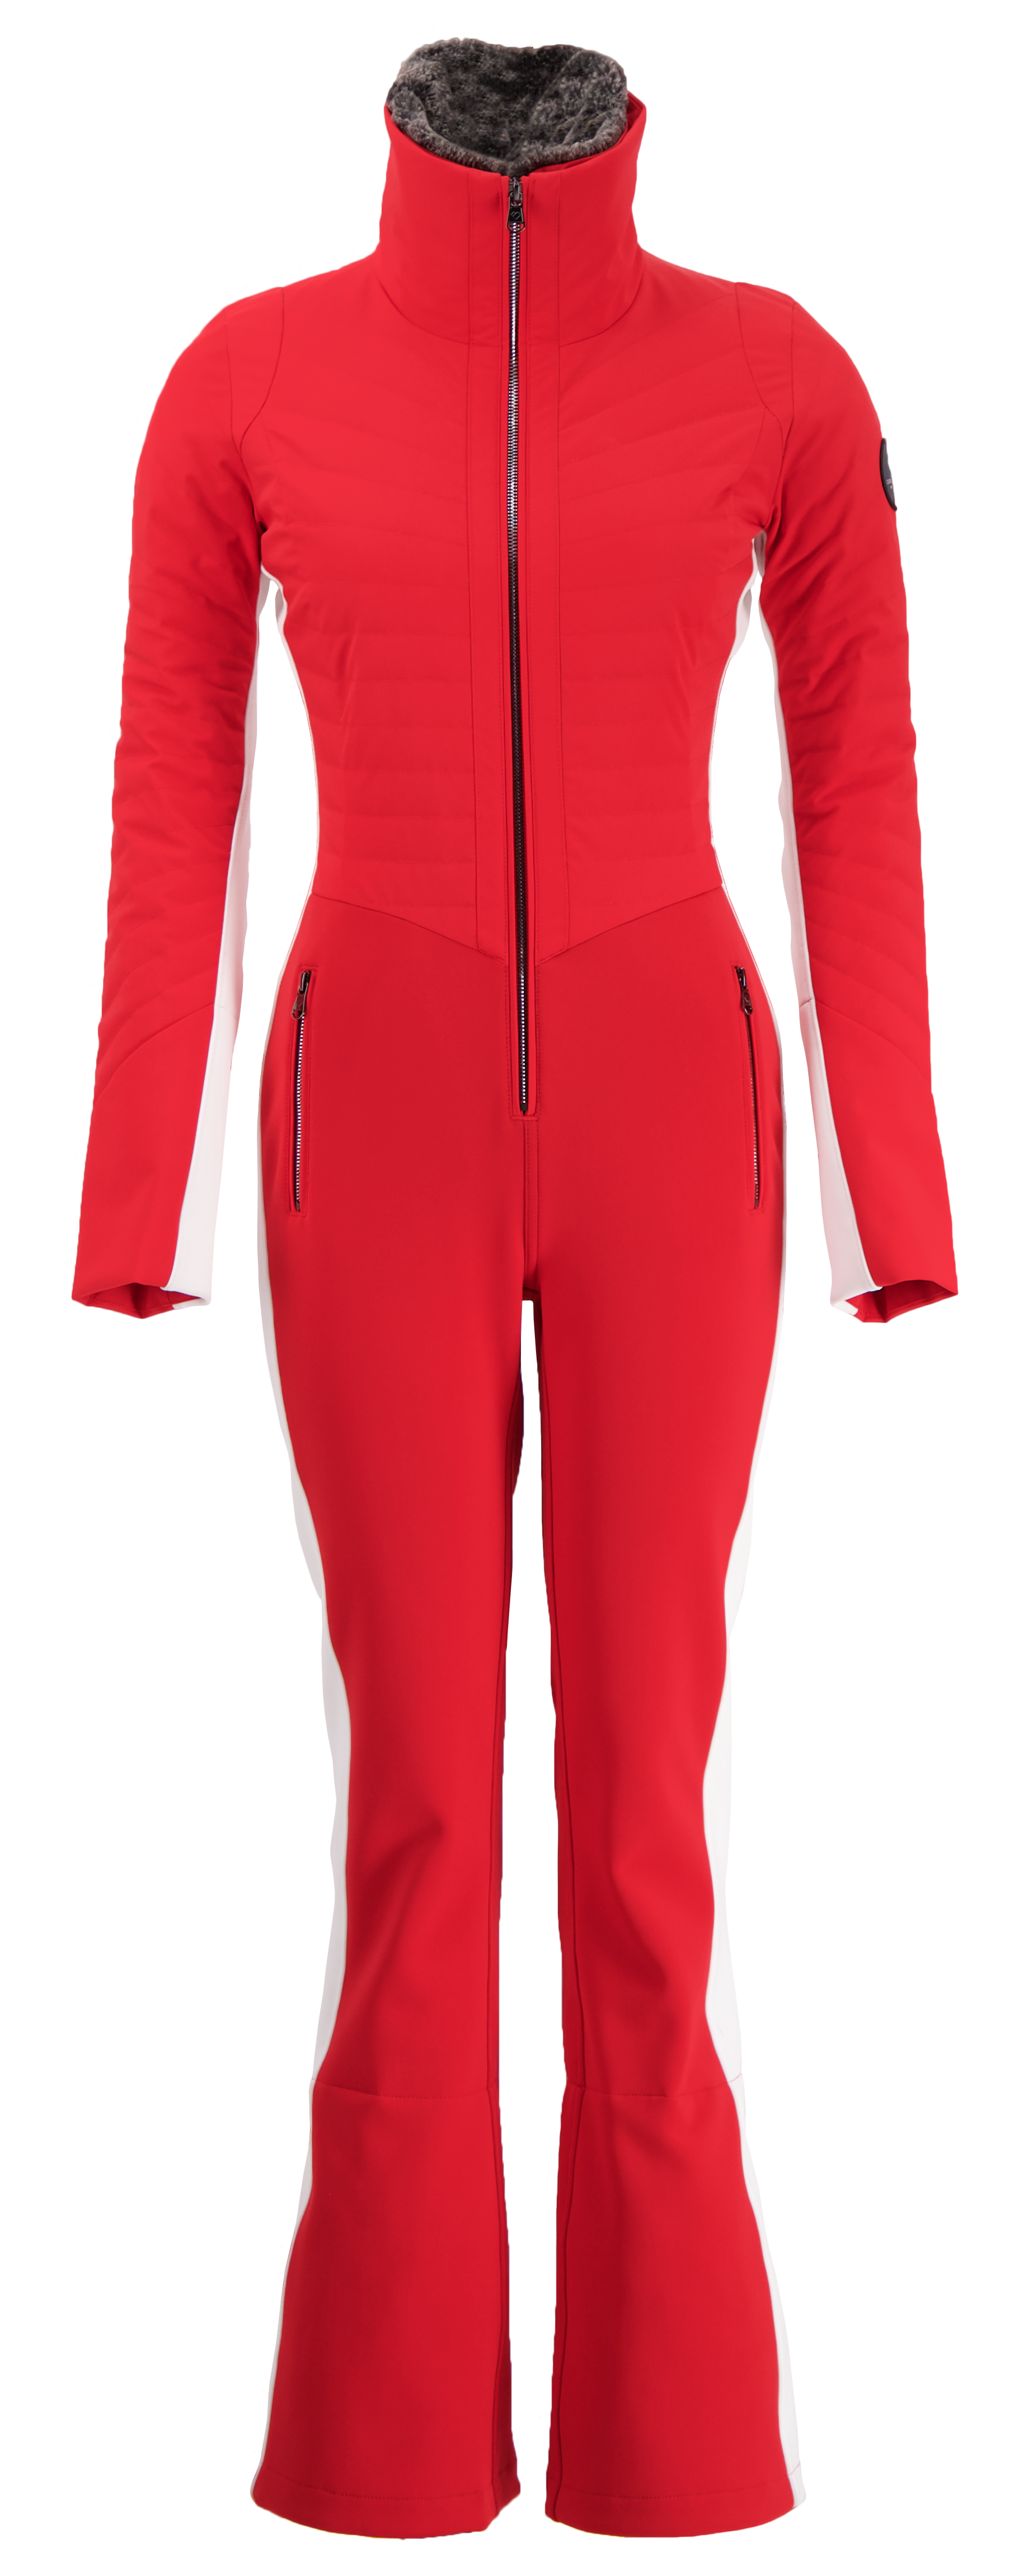 2016 Nordica NRGy 90